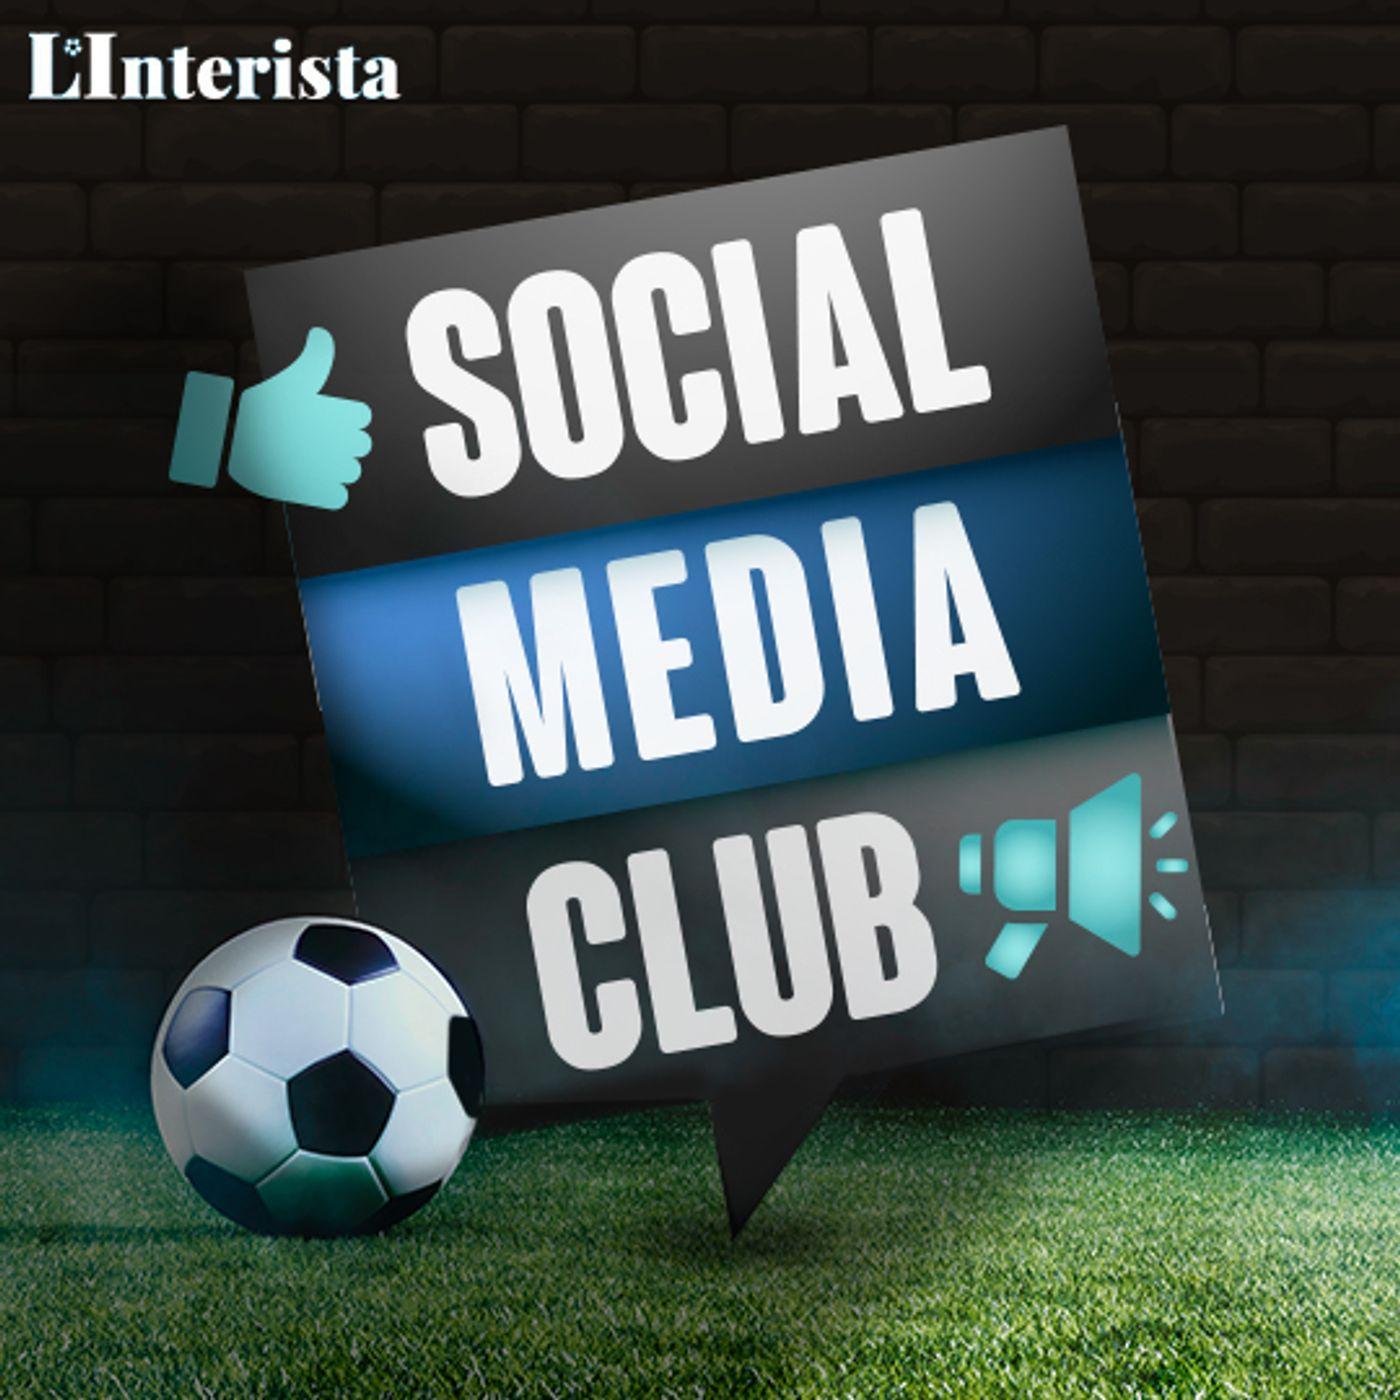 Episodio Social Media Club - 28/07/2021